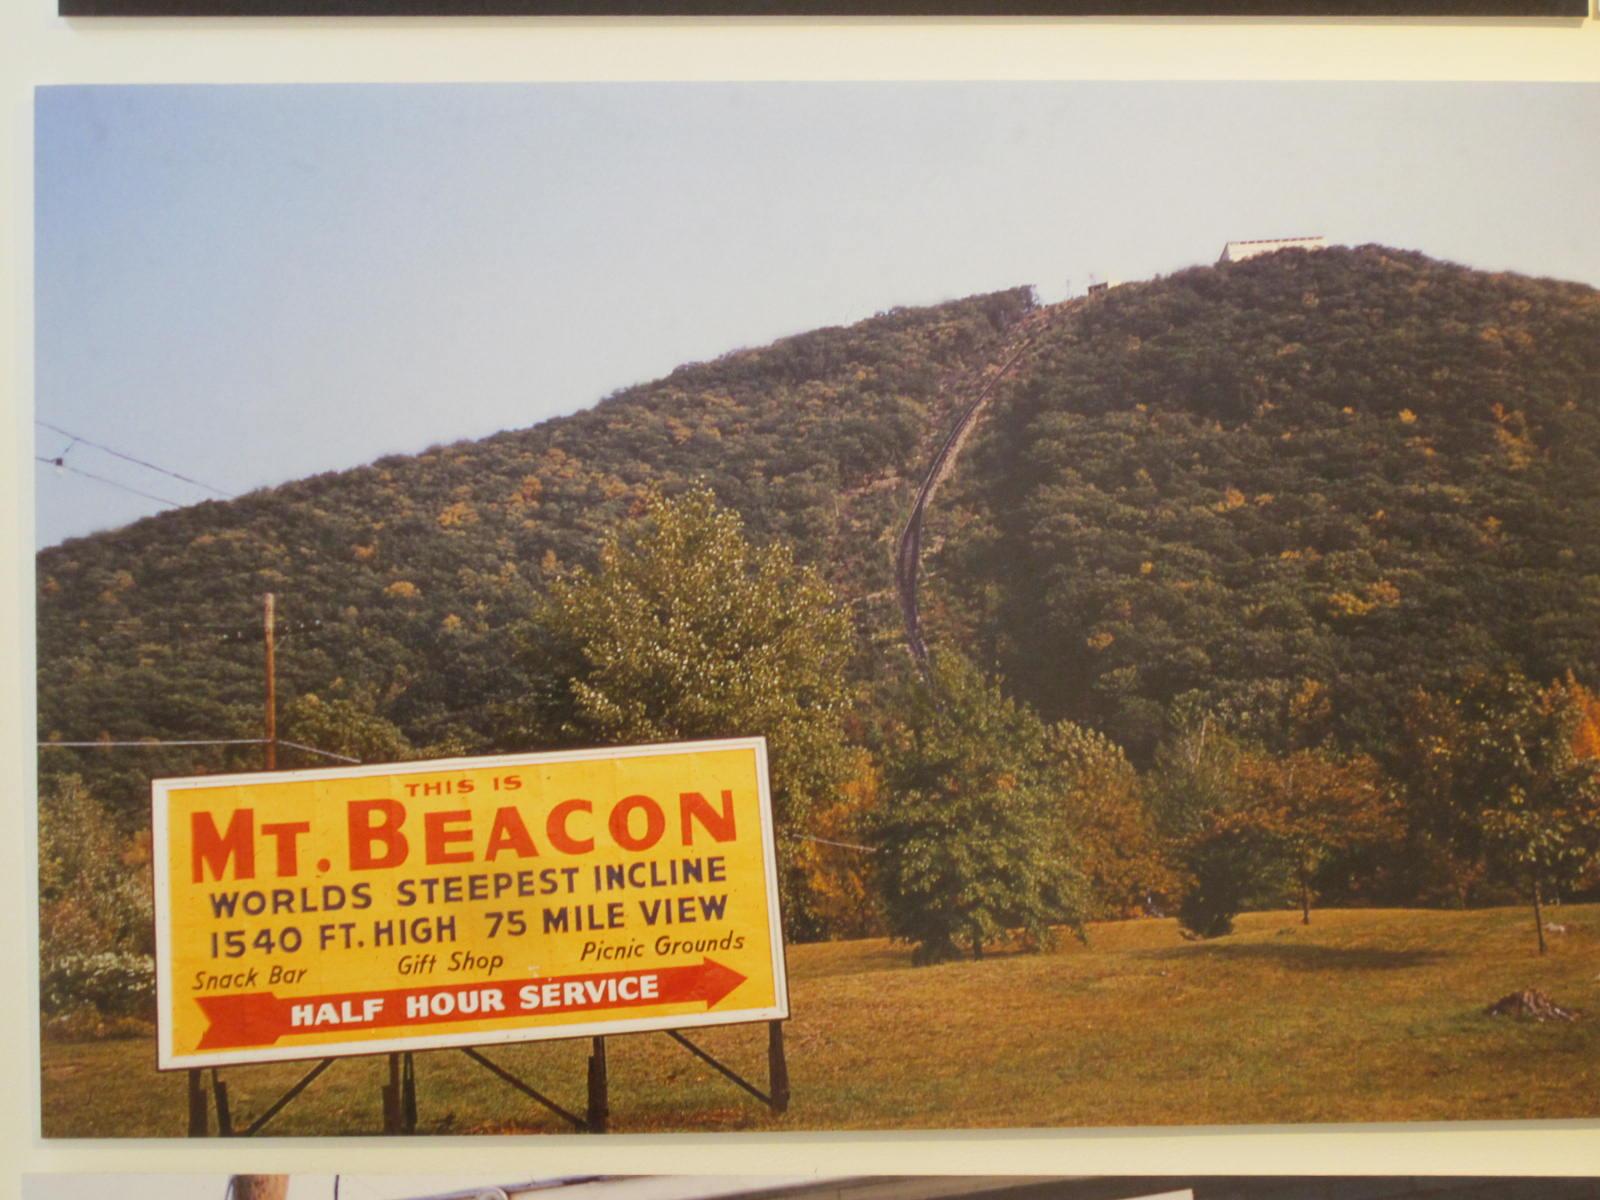 Beacon gambling